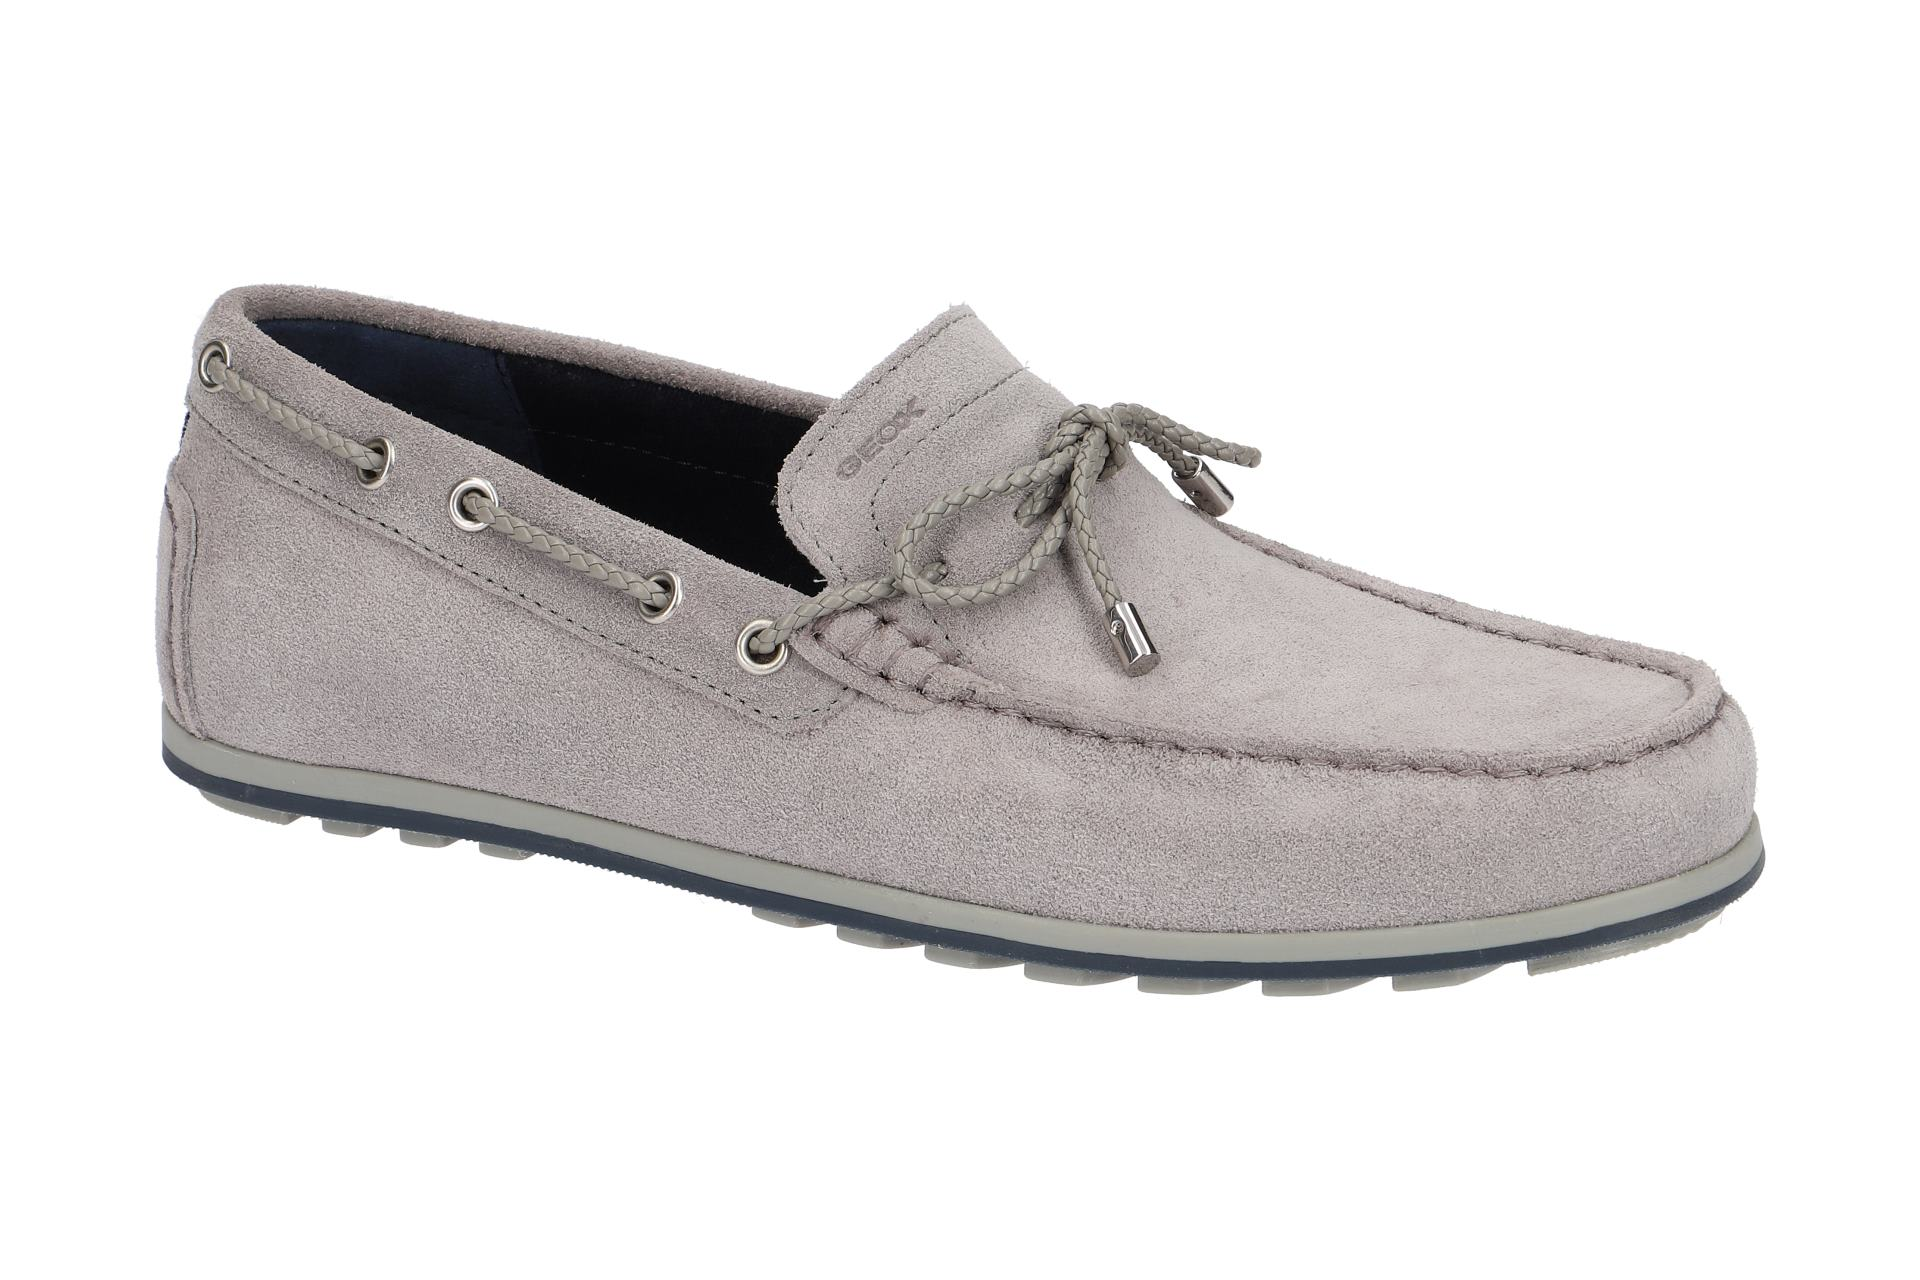 Geox Schuhe SNAKE MOC braun Herrenschuhe bequeme Slipper U7207F 00022 C6005 NEU | eBay